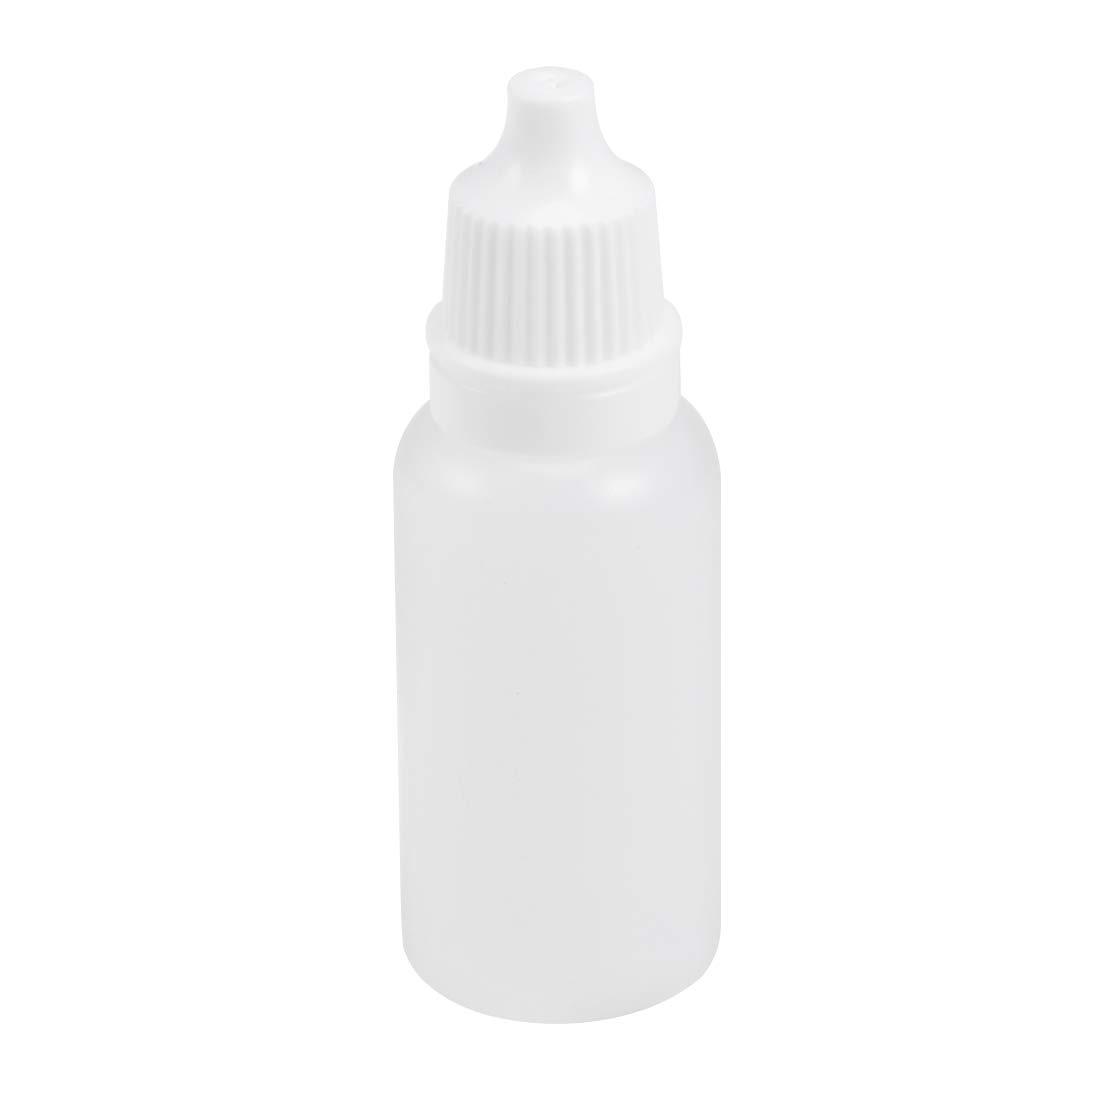 uxcell Plastic Dropper Bottle, 15ml/0.5oz Small Mouth Drop Bottles Empty Squeezable Eye Liquid Dropper Bottle 50pcs